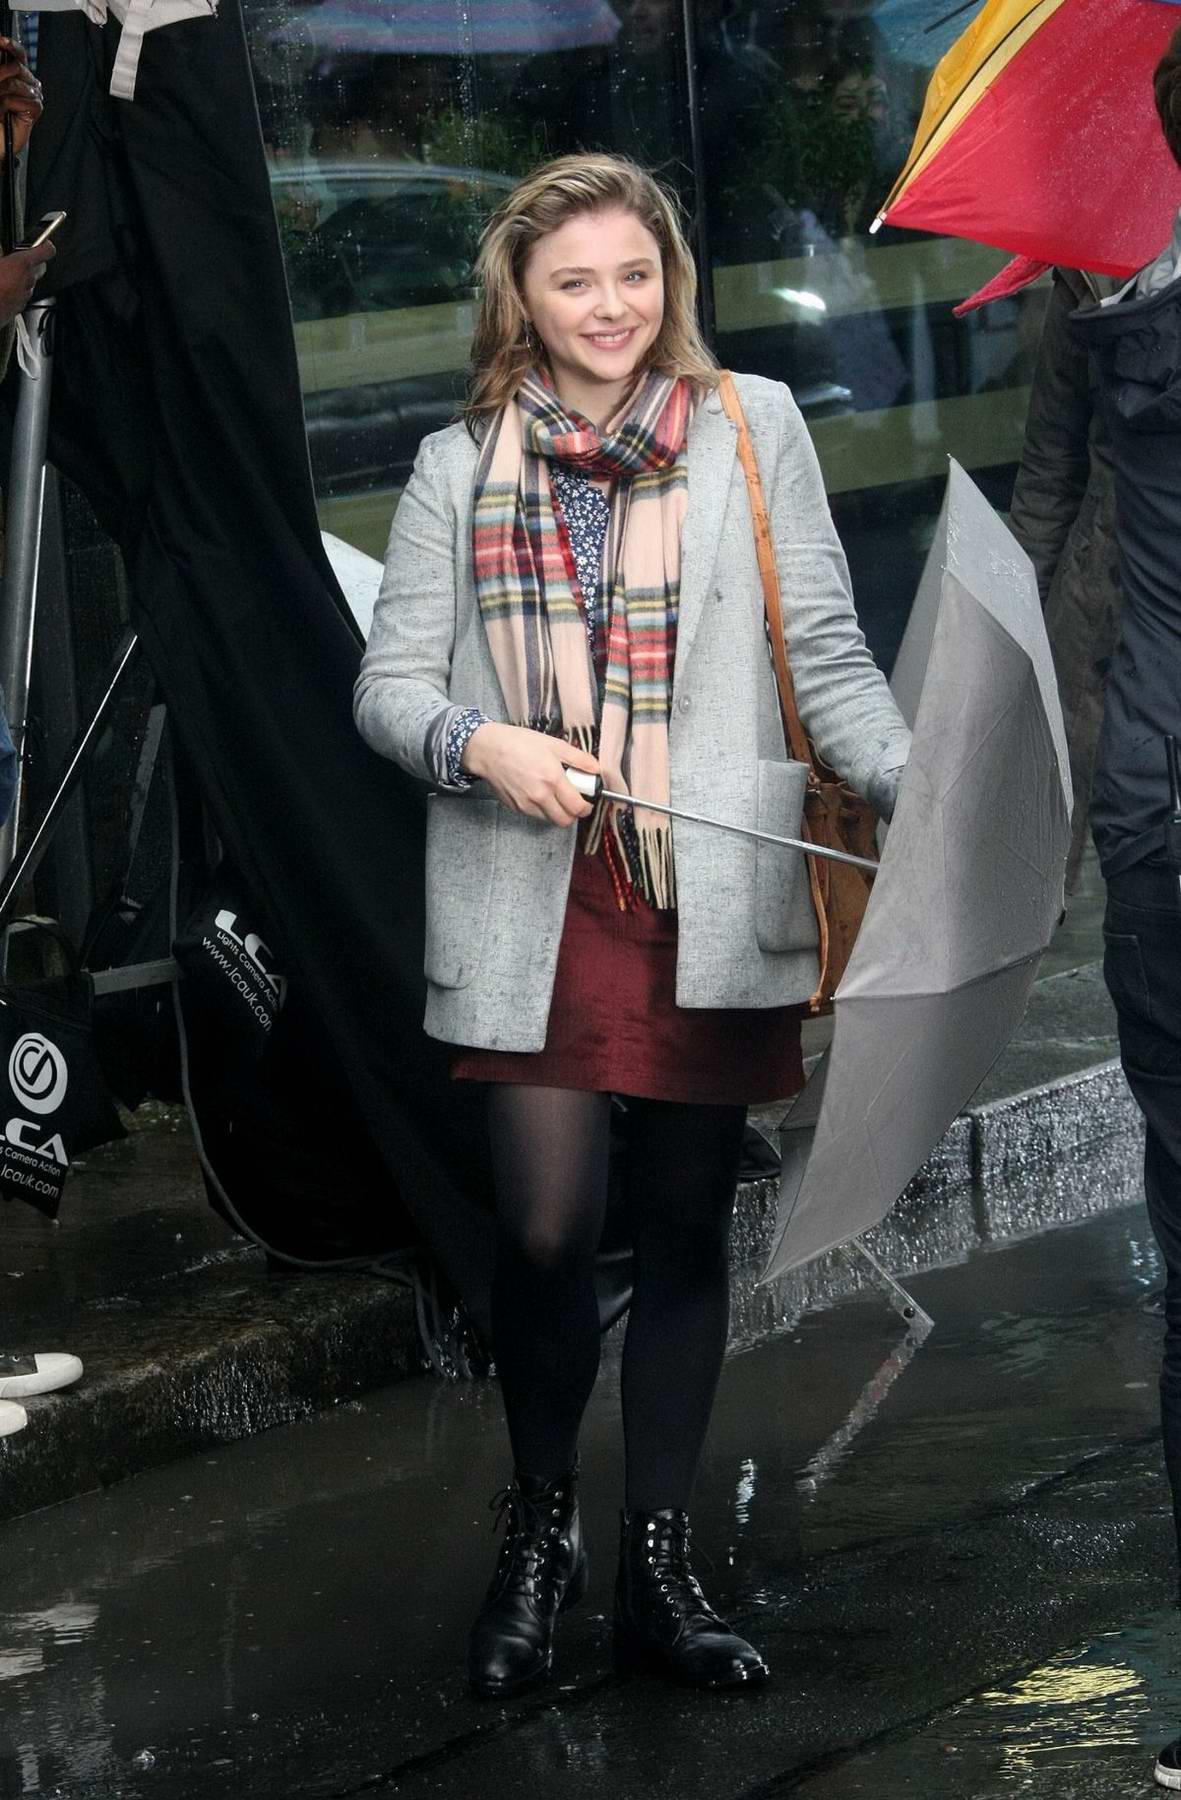 Chloe Grace Moretz on day two of filming of Neil Jordan directed movie 'The Widow' in Dublin, Ireland